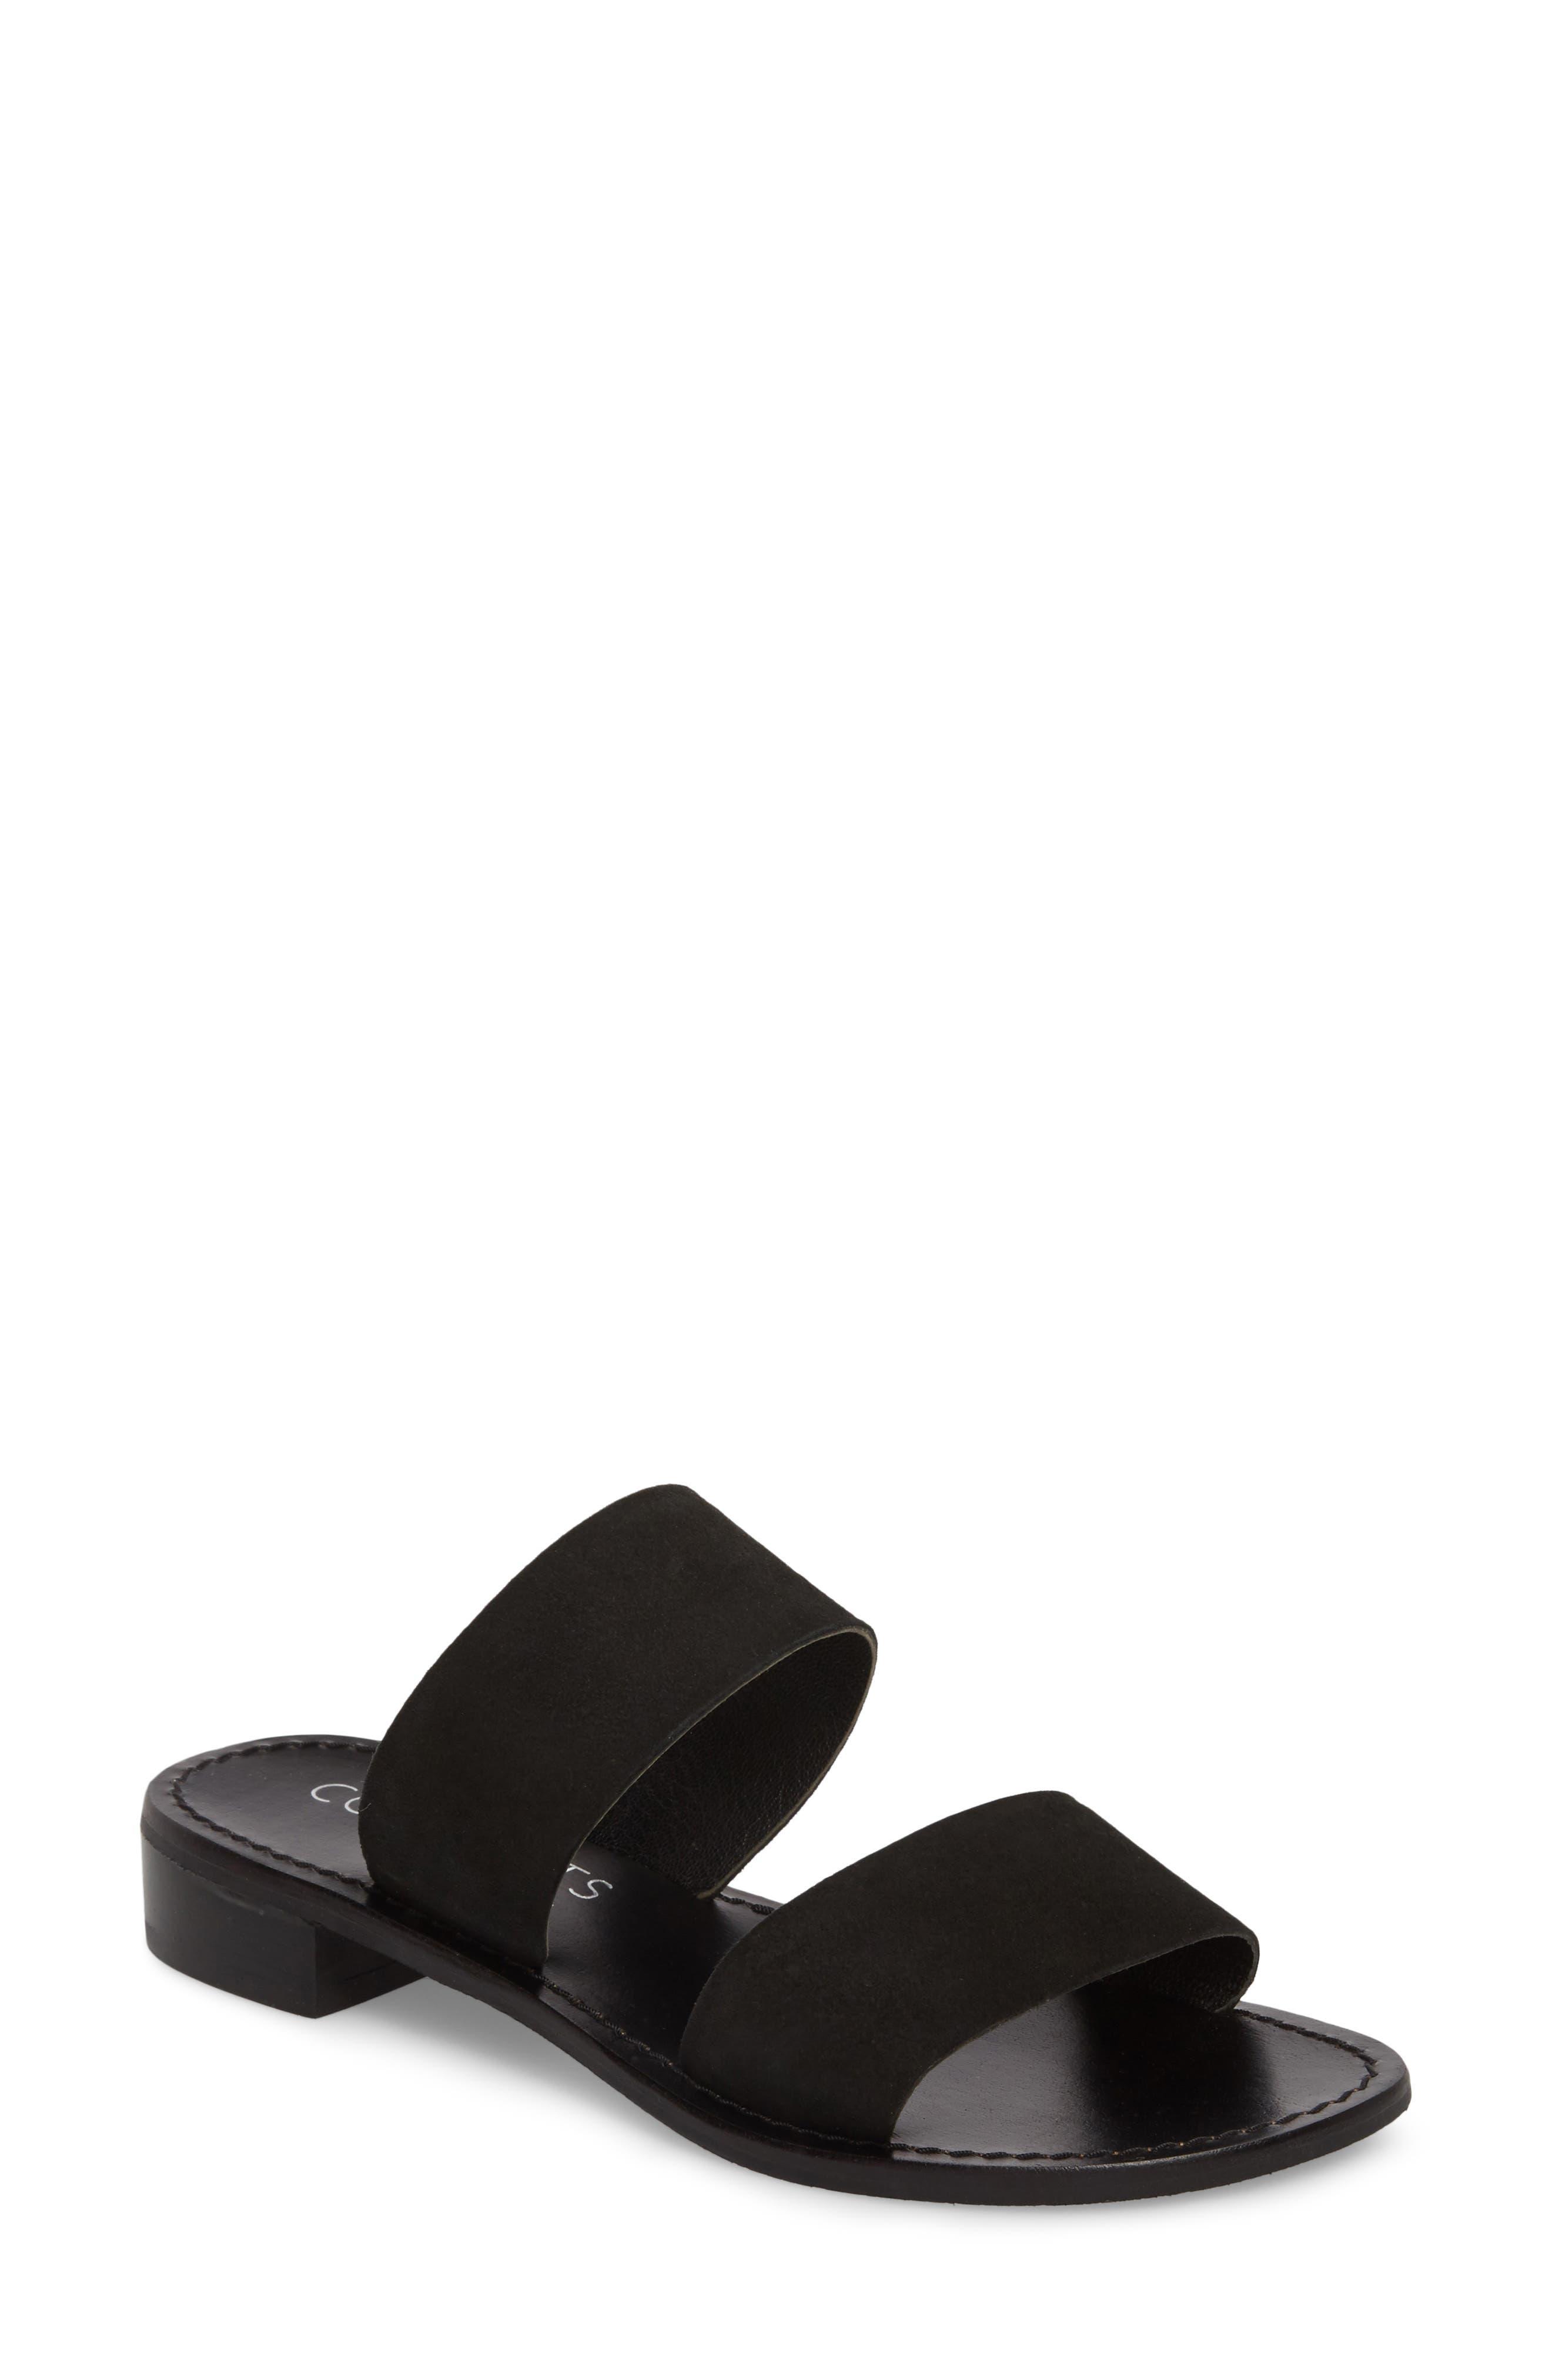 Limelight Slide Sandal,                         Main,                         color,